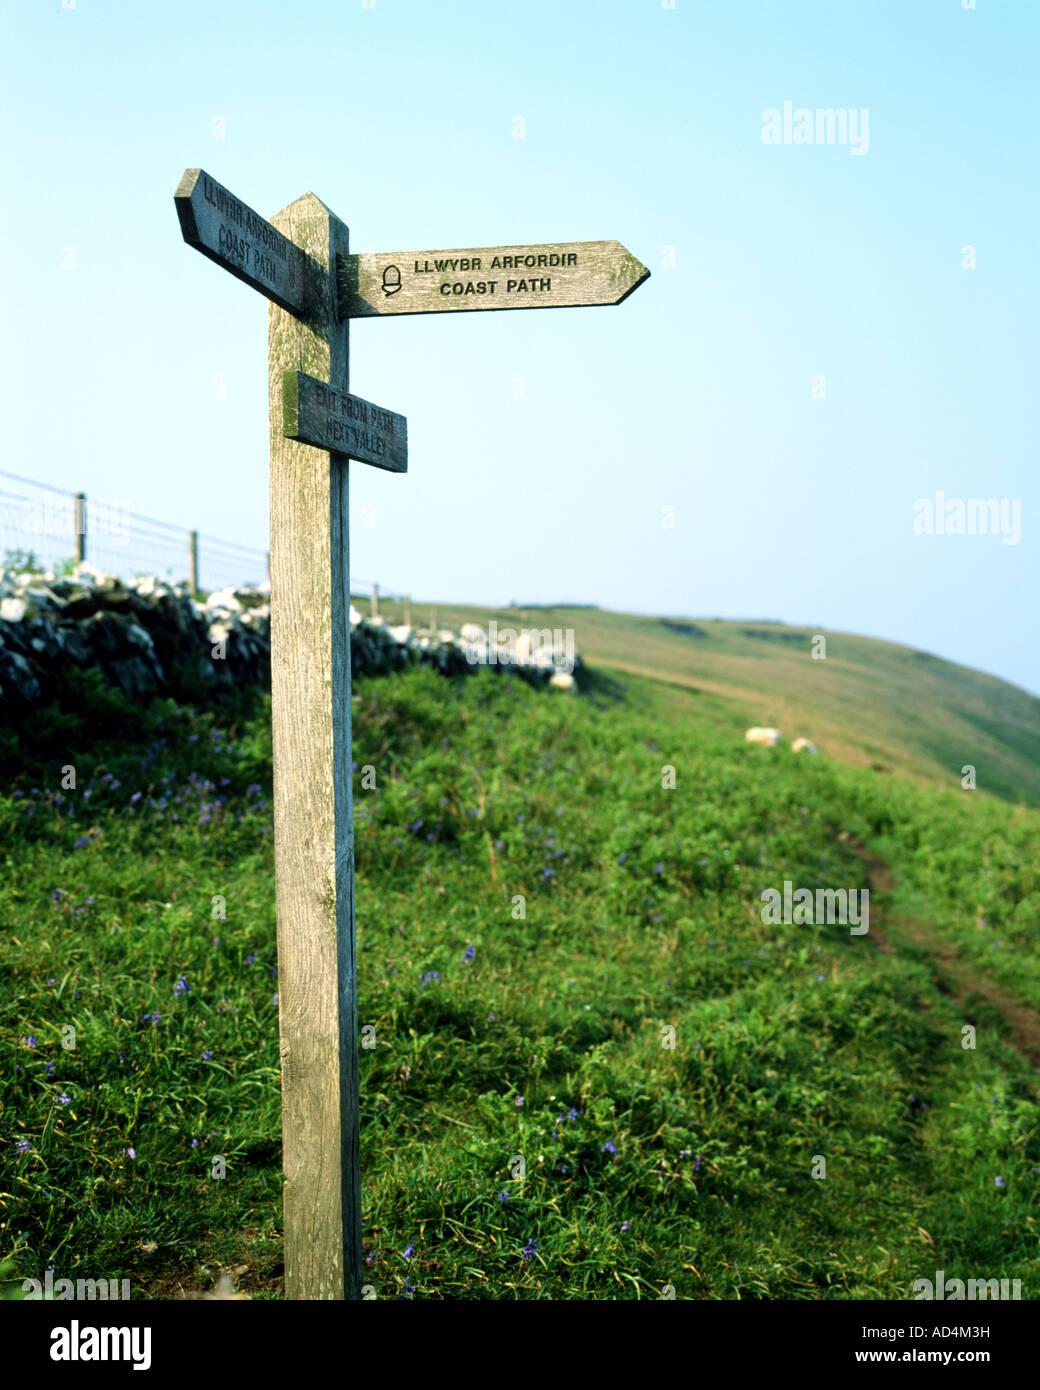 coastal path llwybr arfordir sign cemaes head north pembrokeshire - Stock Image